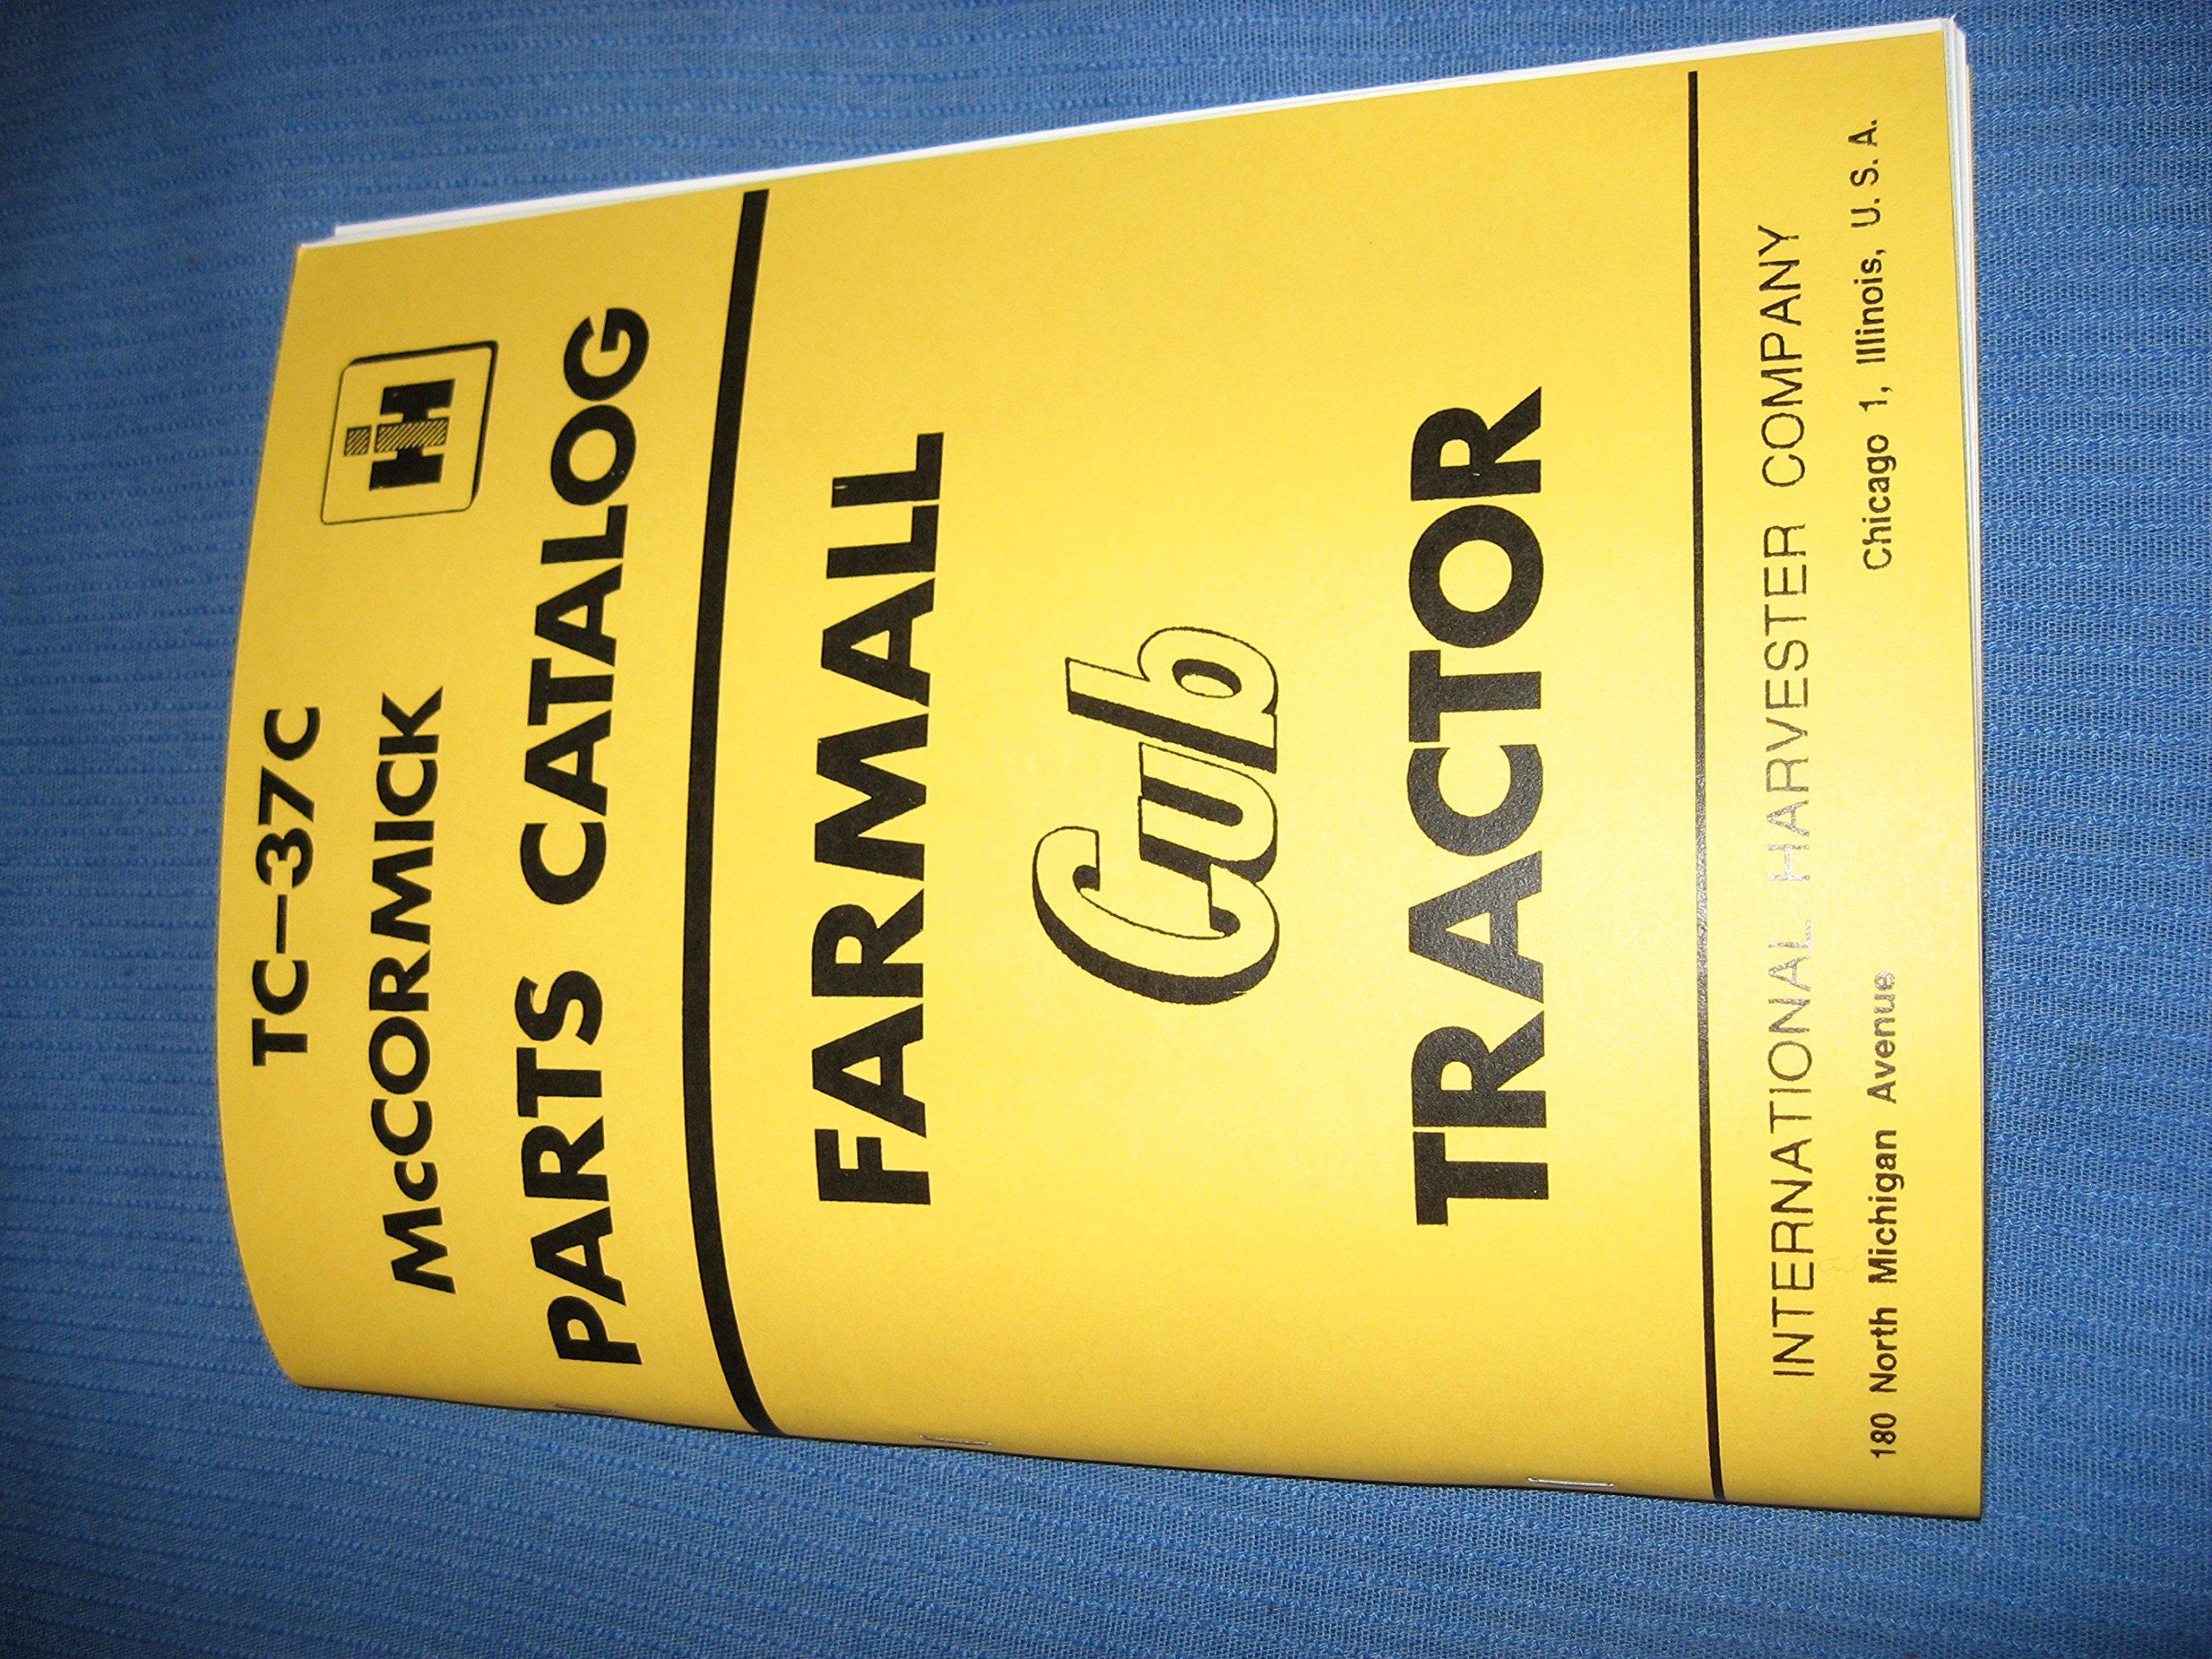 Mccormick Farmall Cub Tractor Parts Catalog Tc 37c International Wiring Harness Harvester Co Books